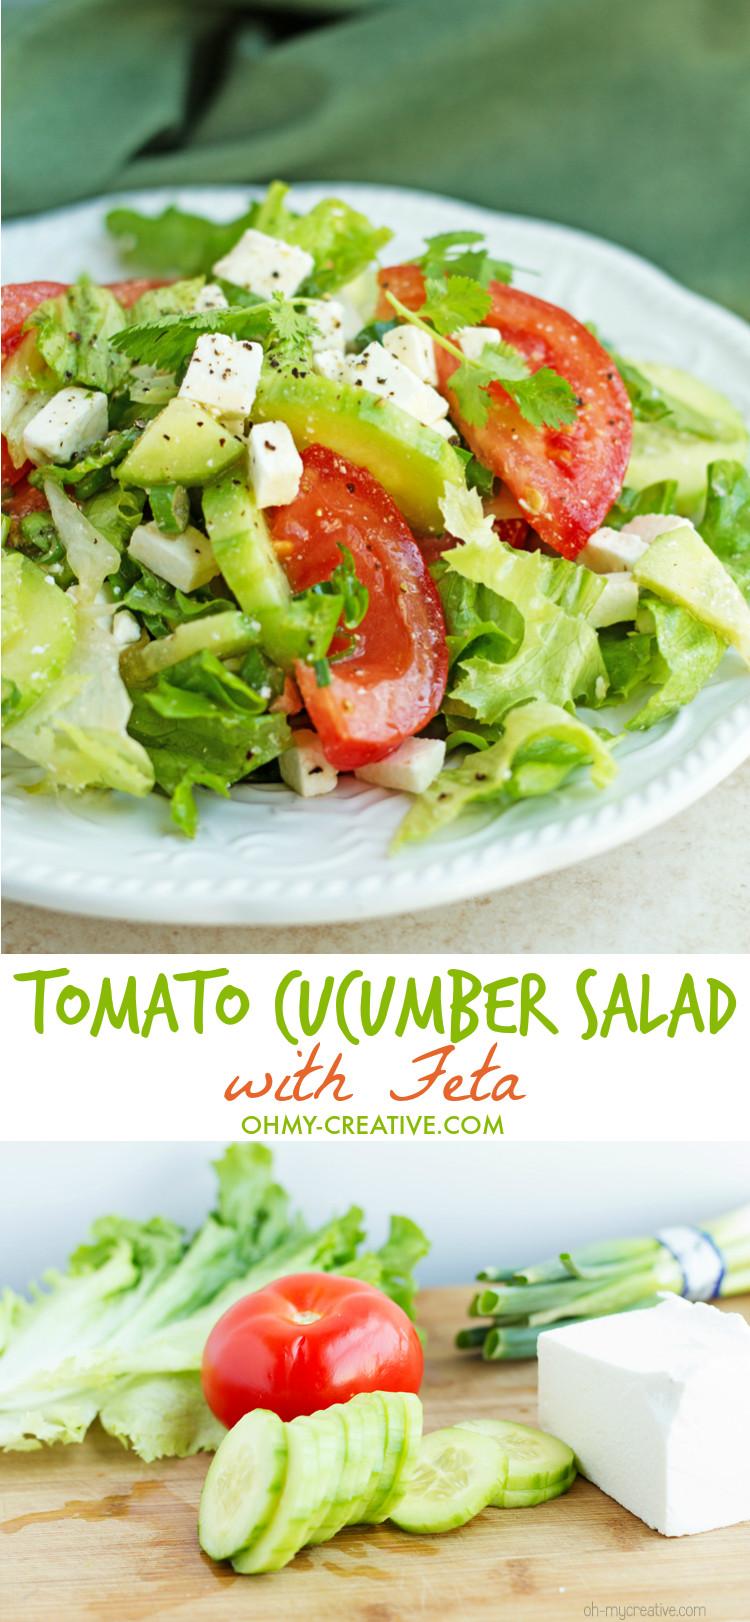 Tomato Salad Recipe  Tomato Cucumber Salad With Feta Oh My Creative